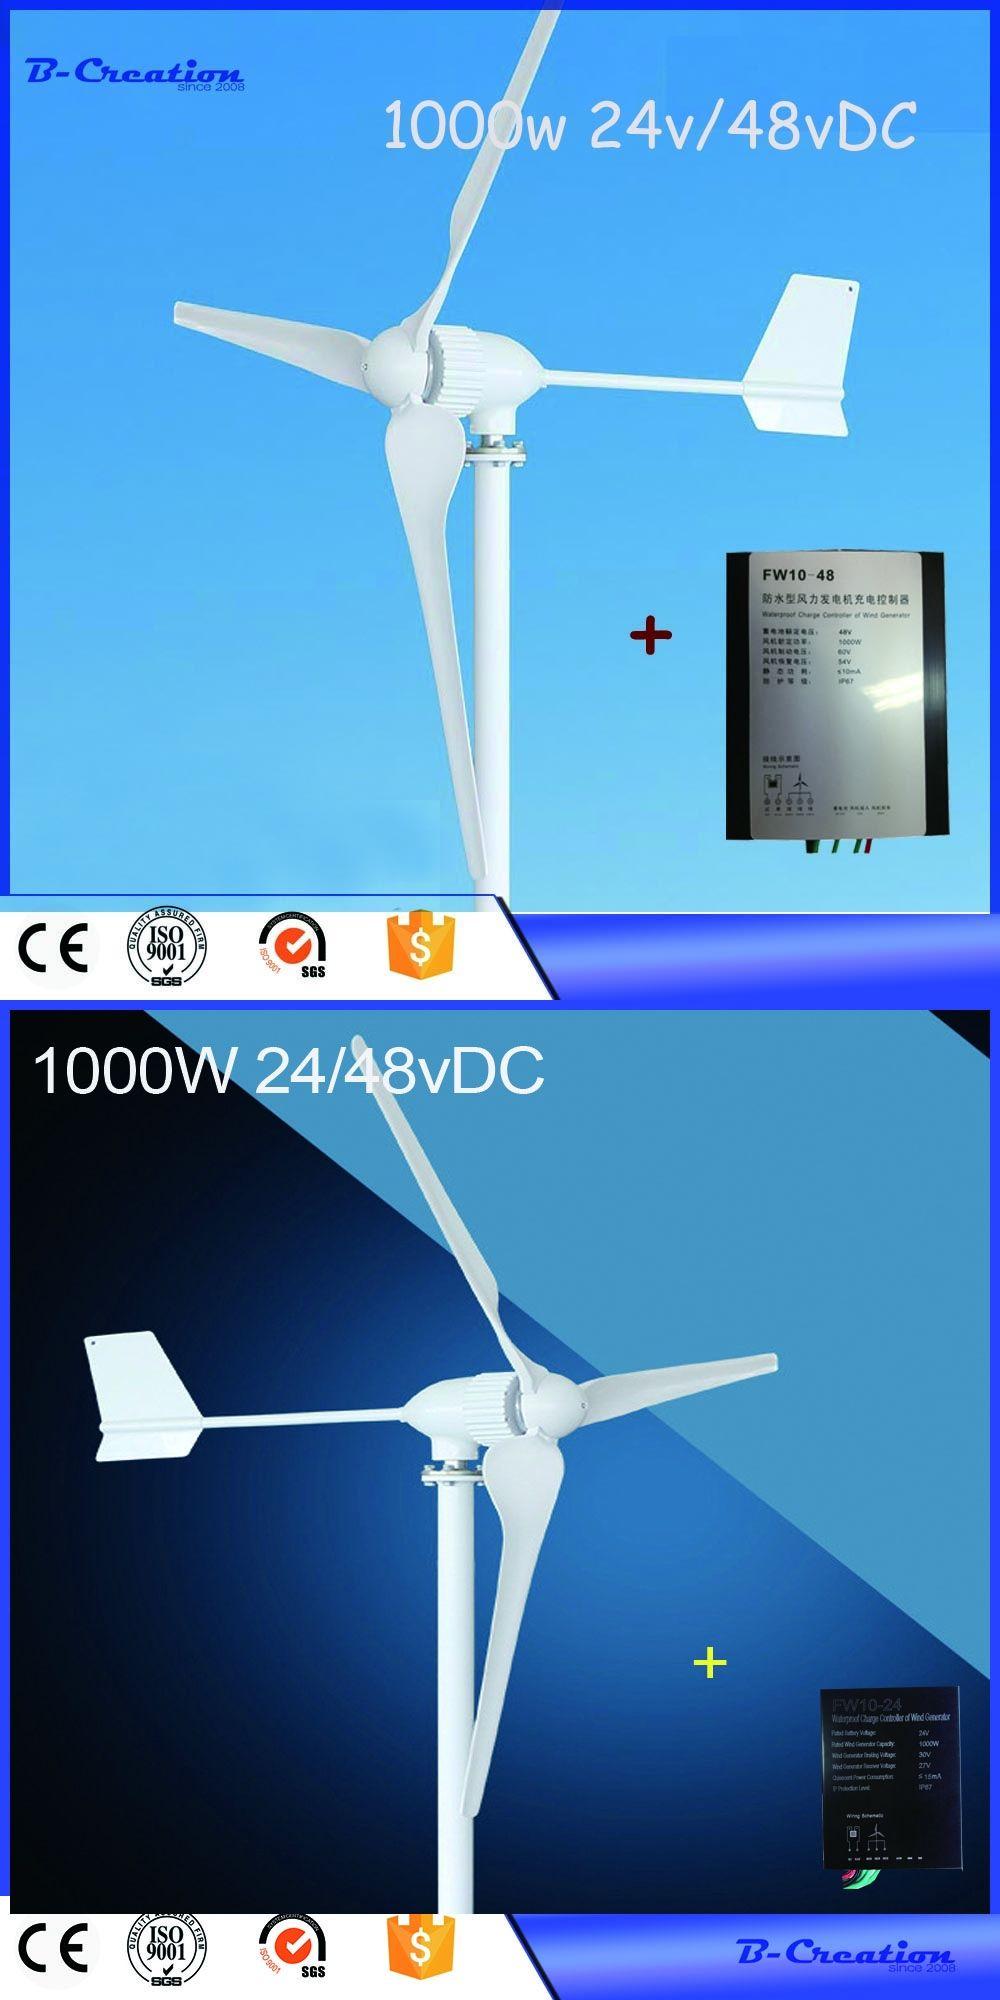 2017 1000W 24V 48V wind turbine generator with Waterproof Wind